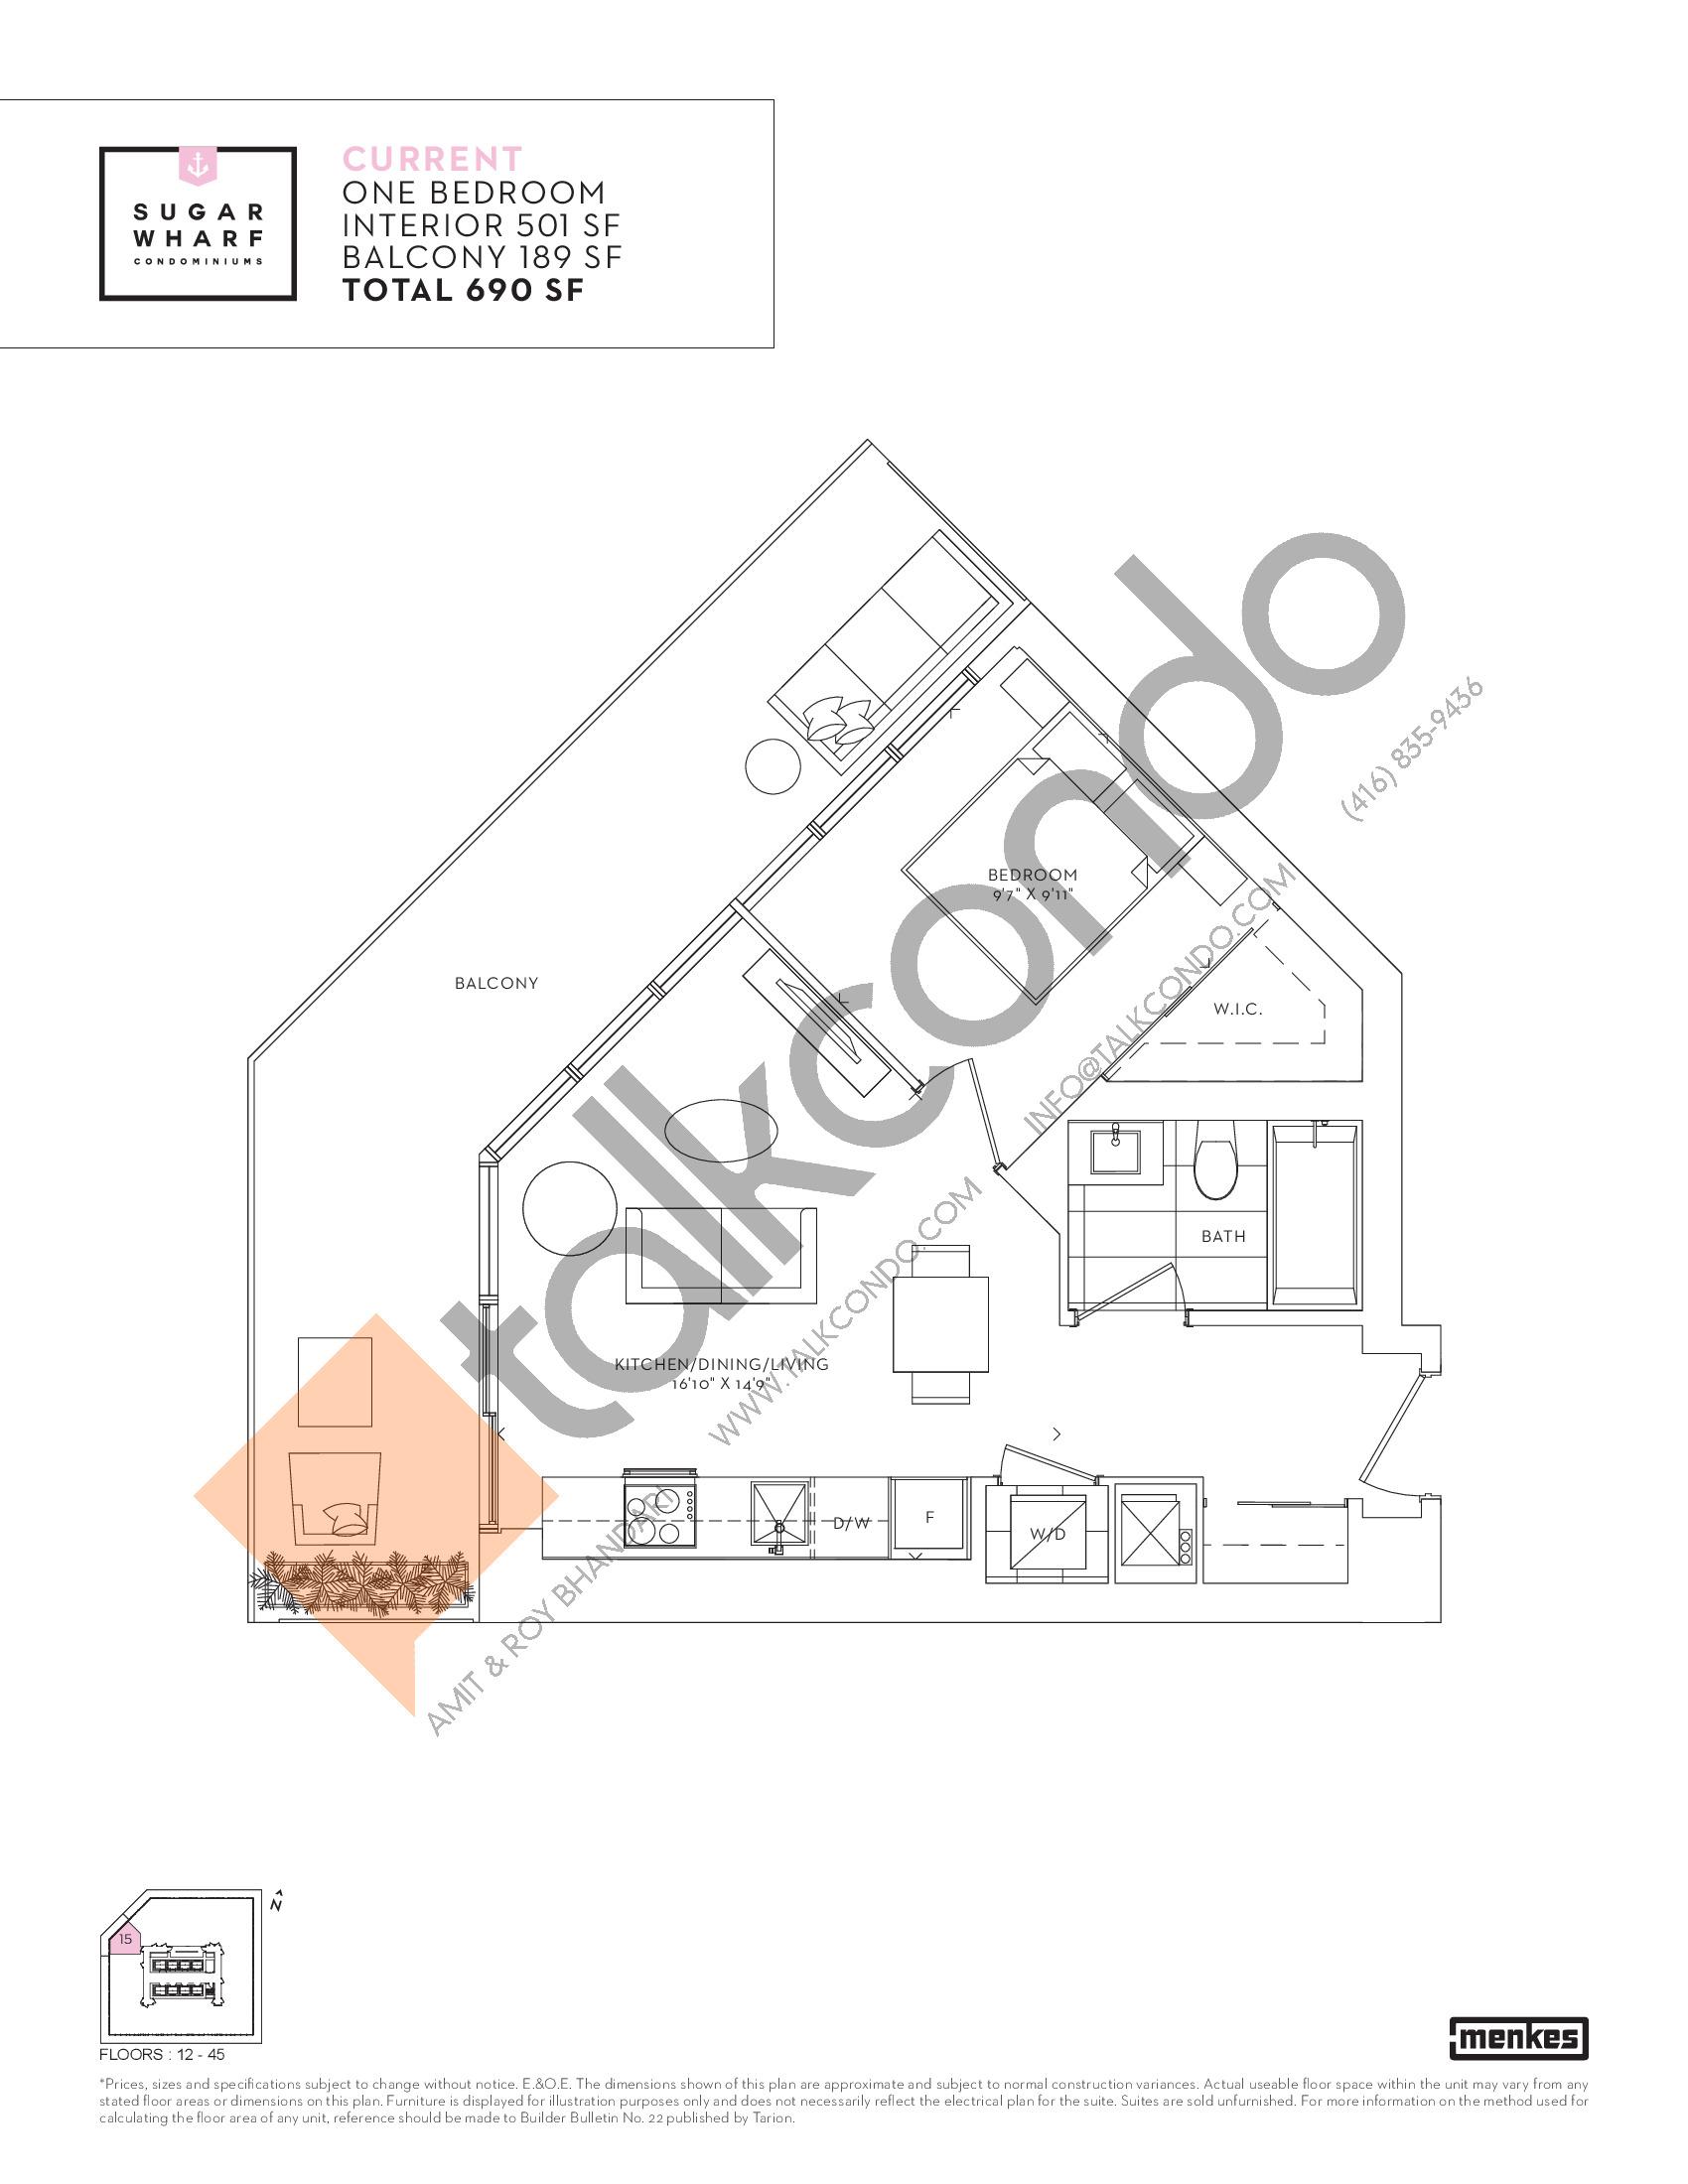 Current Floor Plan at Sugar Wharf Condos East Tower - 501 sq.ft